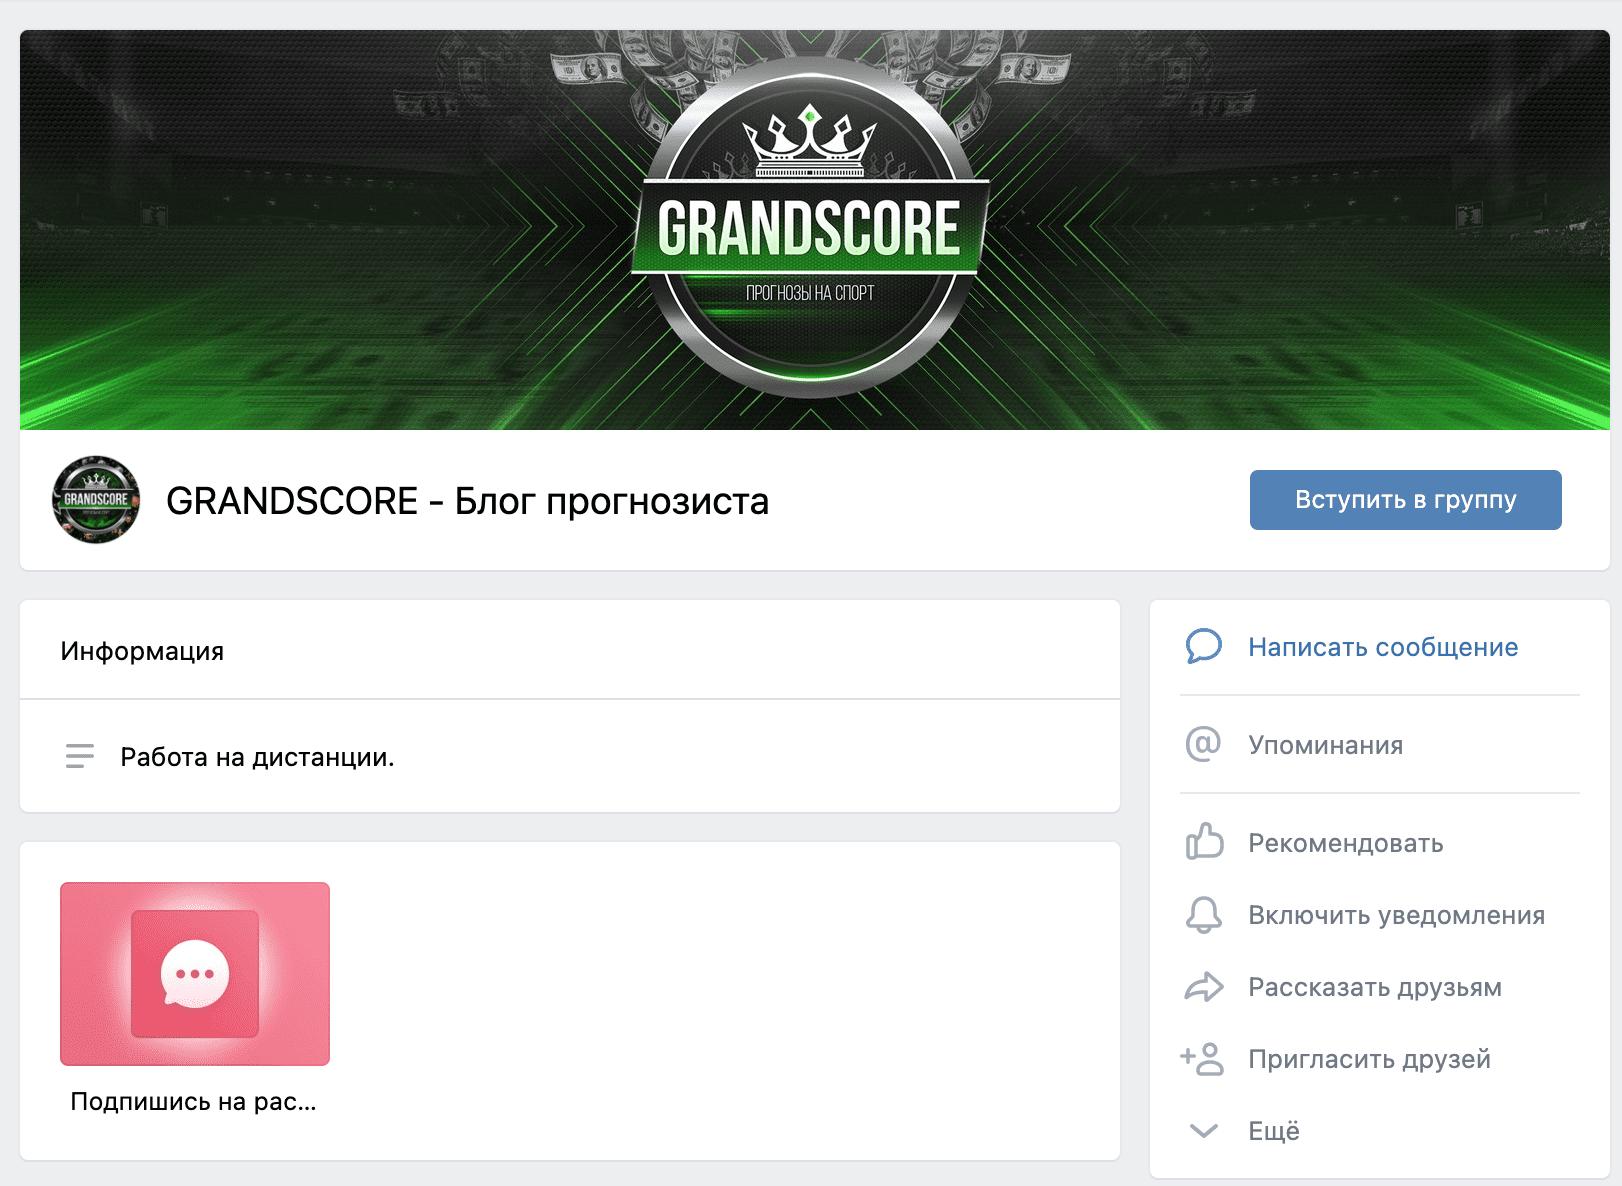 Группа ВК Grandscore